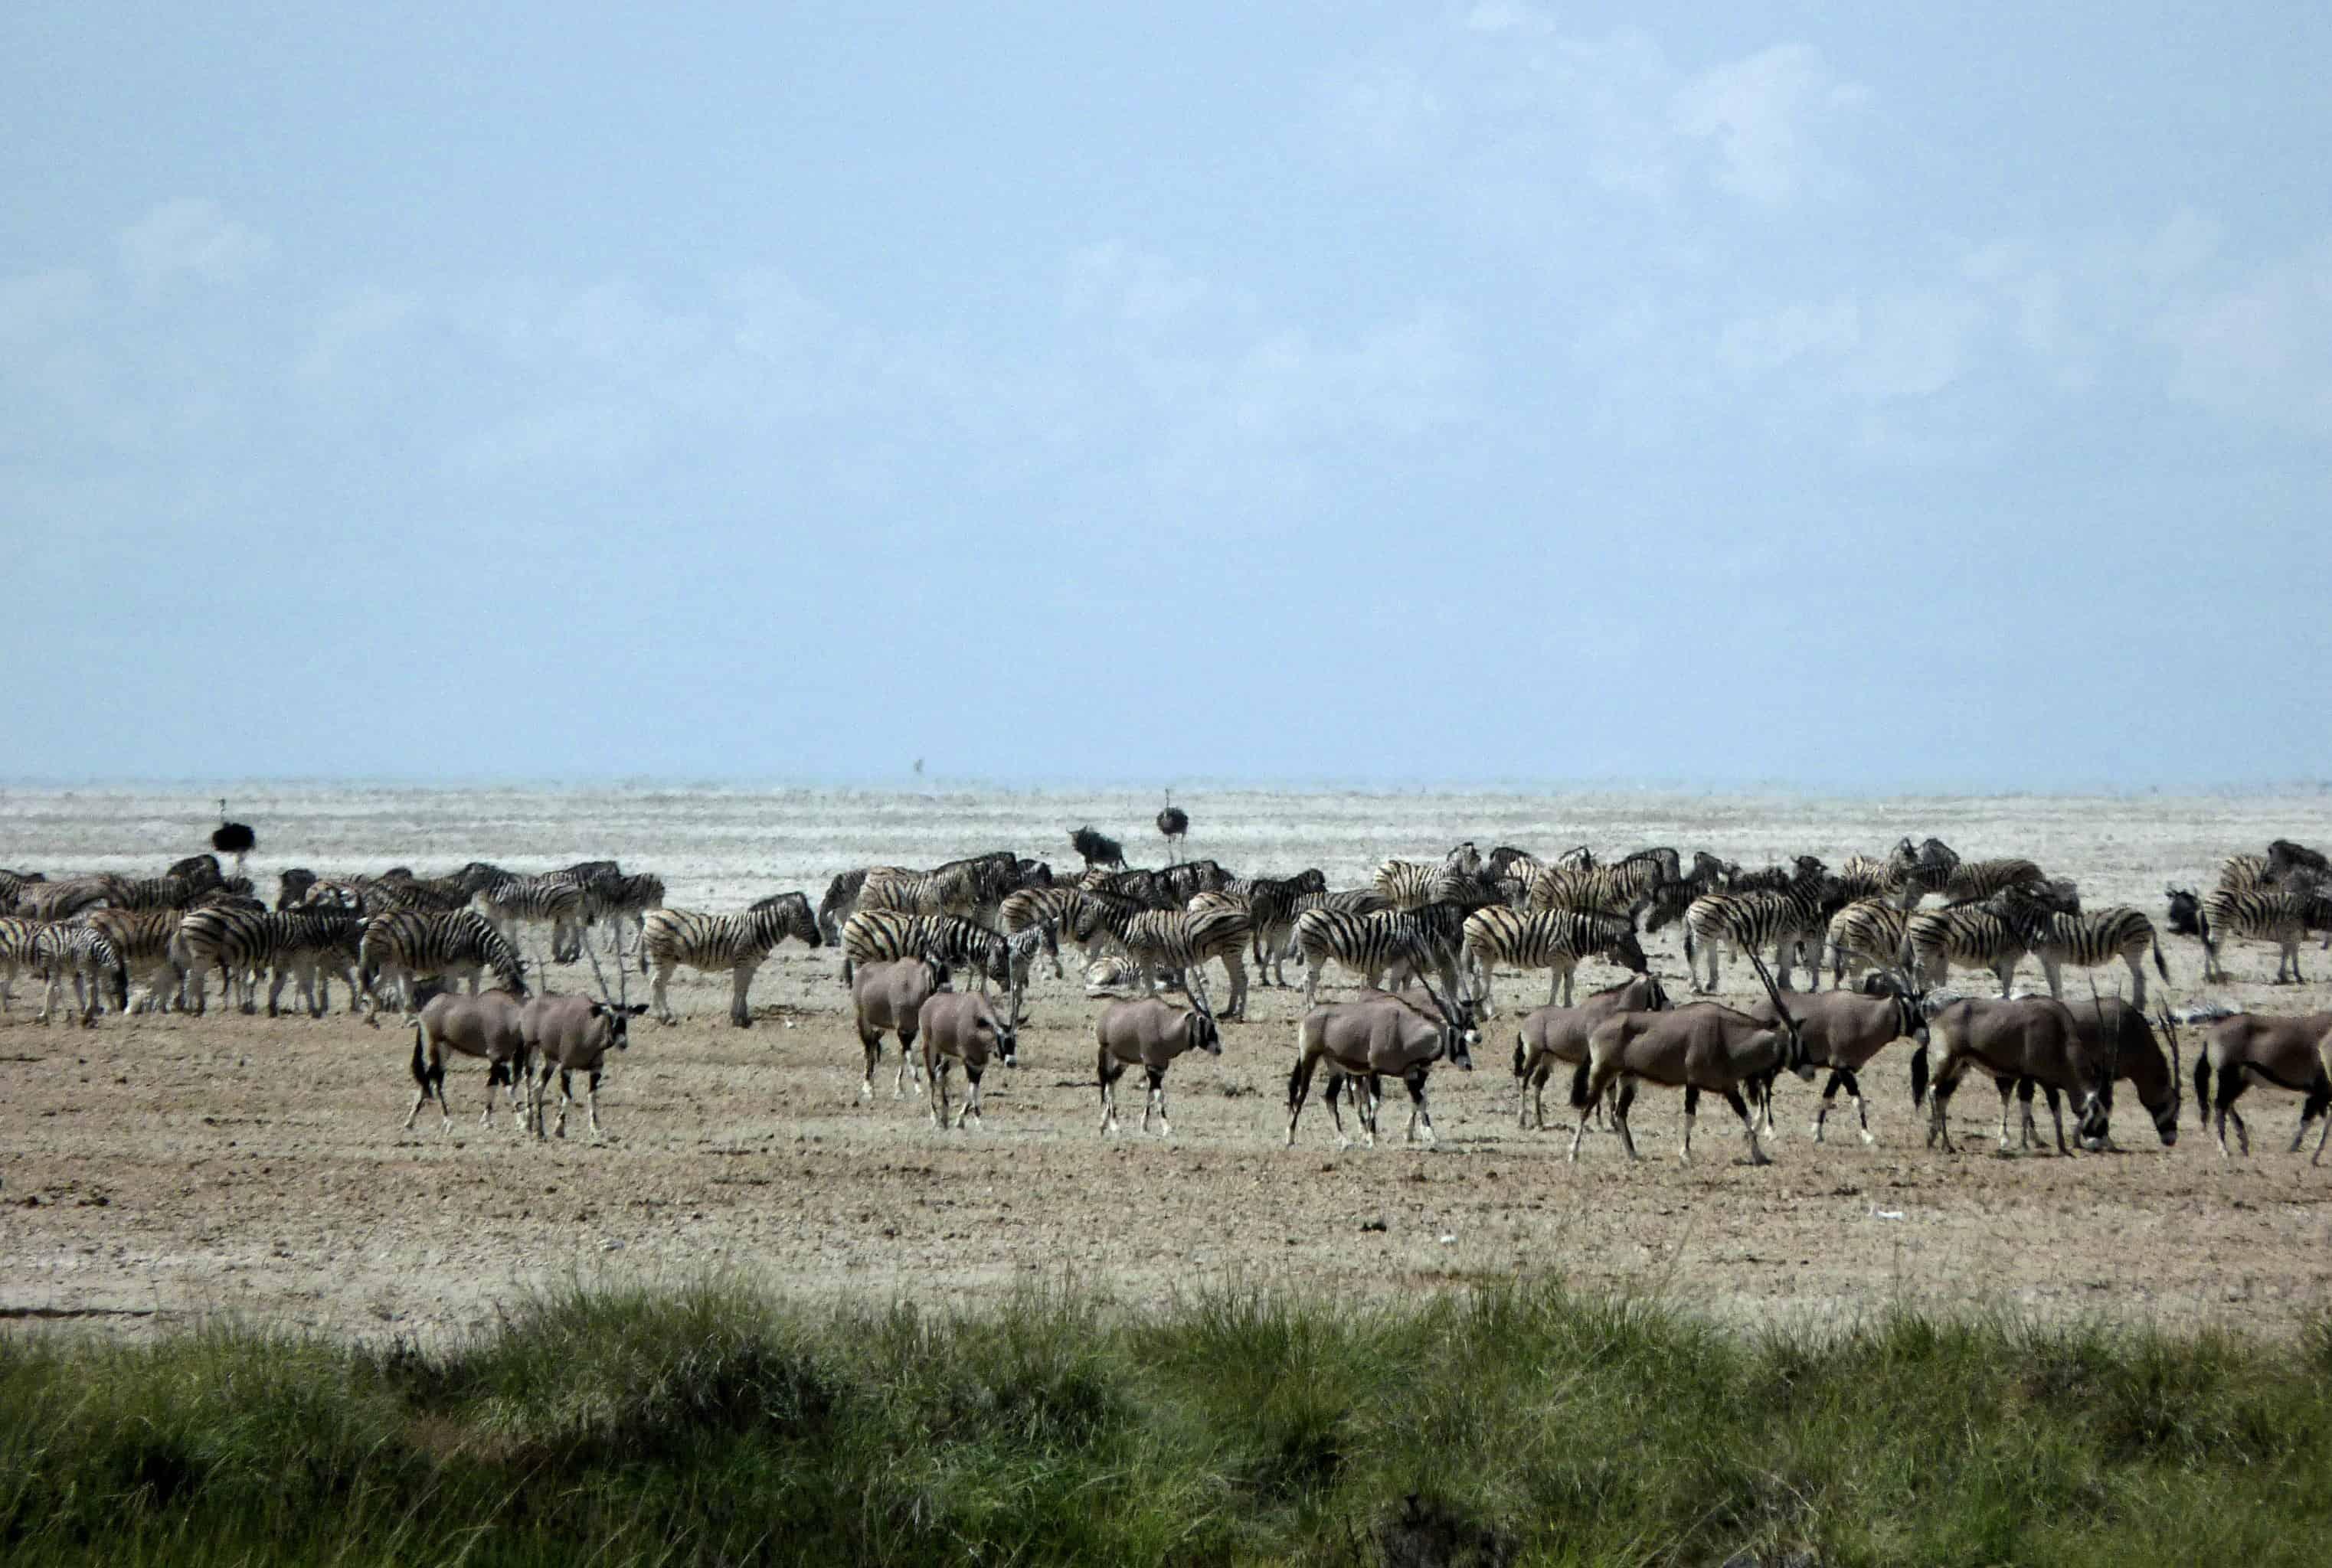 Etosha National Park, the Pan